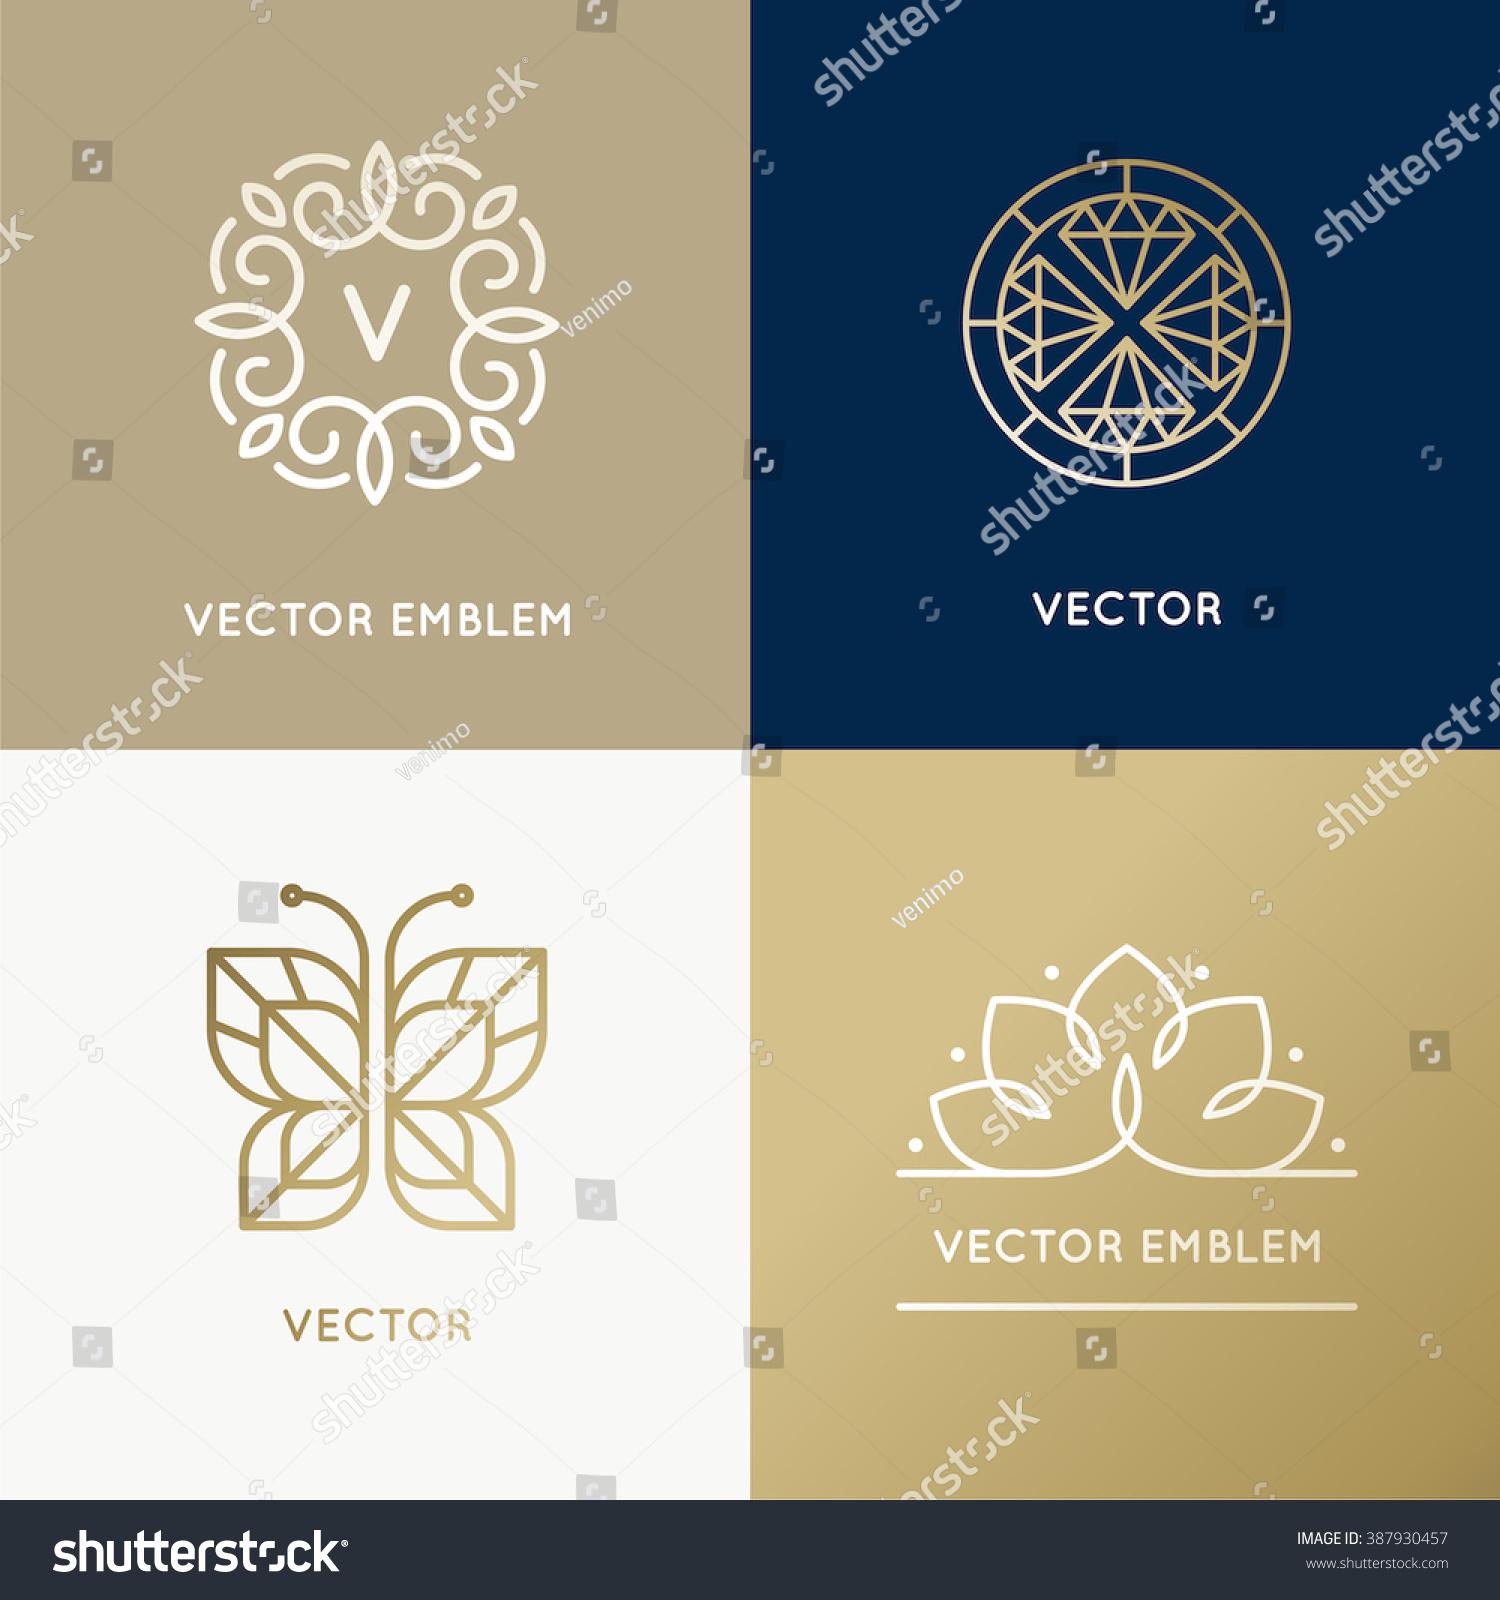 Butterfly Jewelry Logo Linear Vector Icon:  Vector Abstract Modern Logo Design Templates Stock Vector